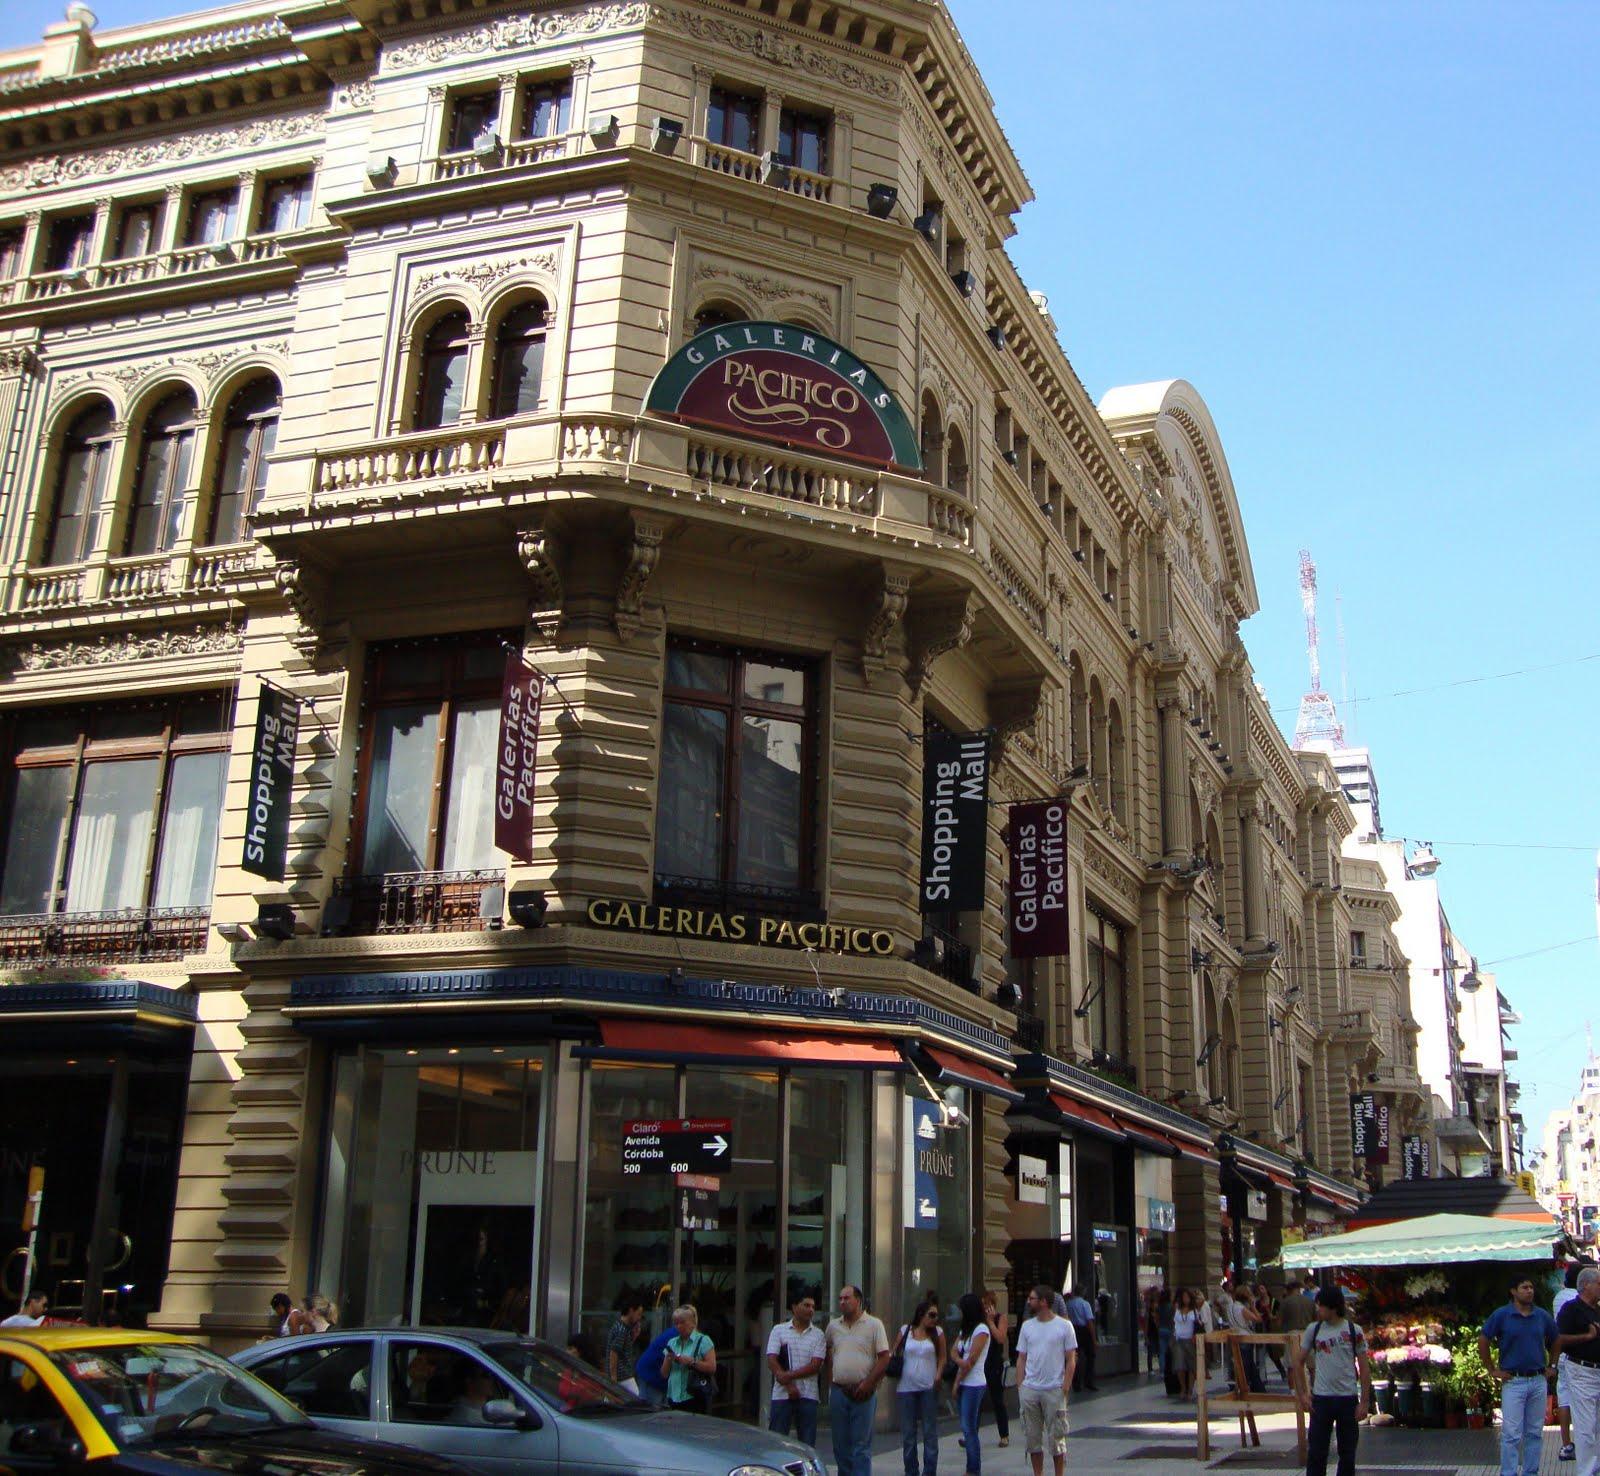 Galerias Pacifico: Fi's Adventures In South America: La Galeria Pacifico